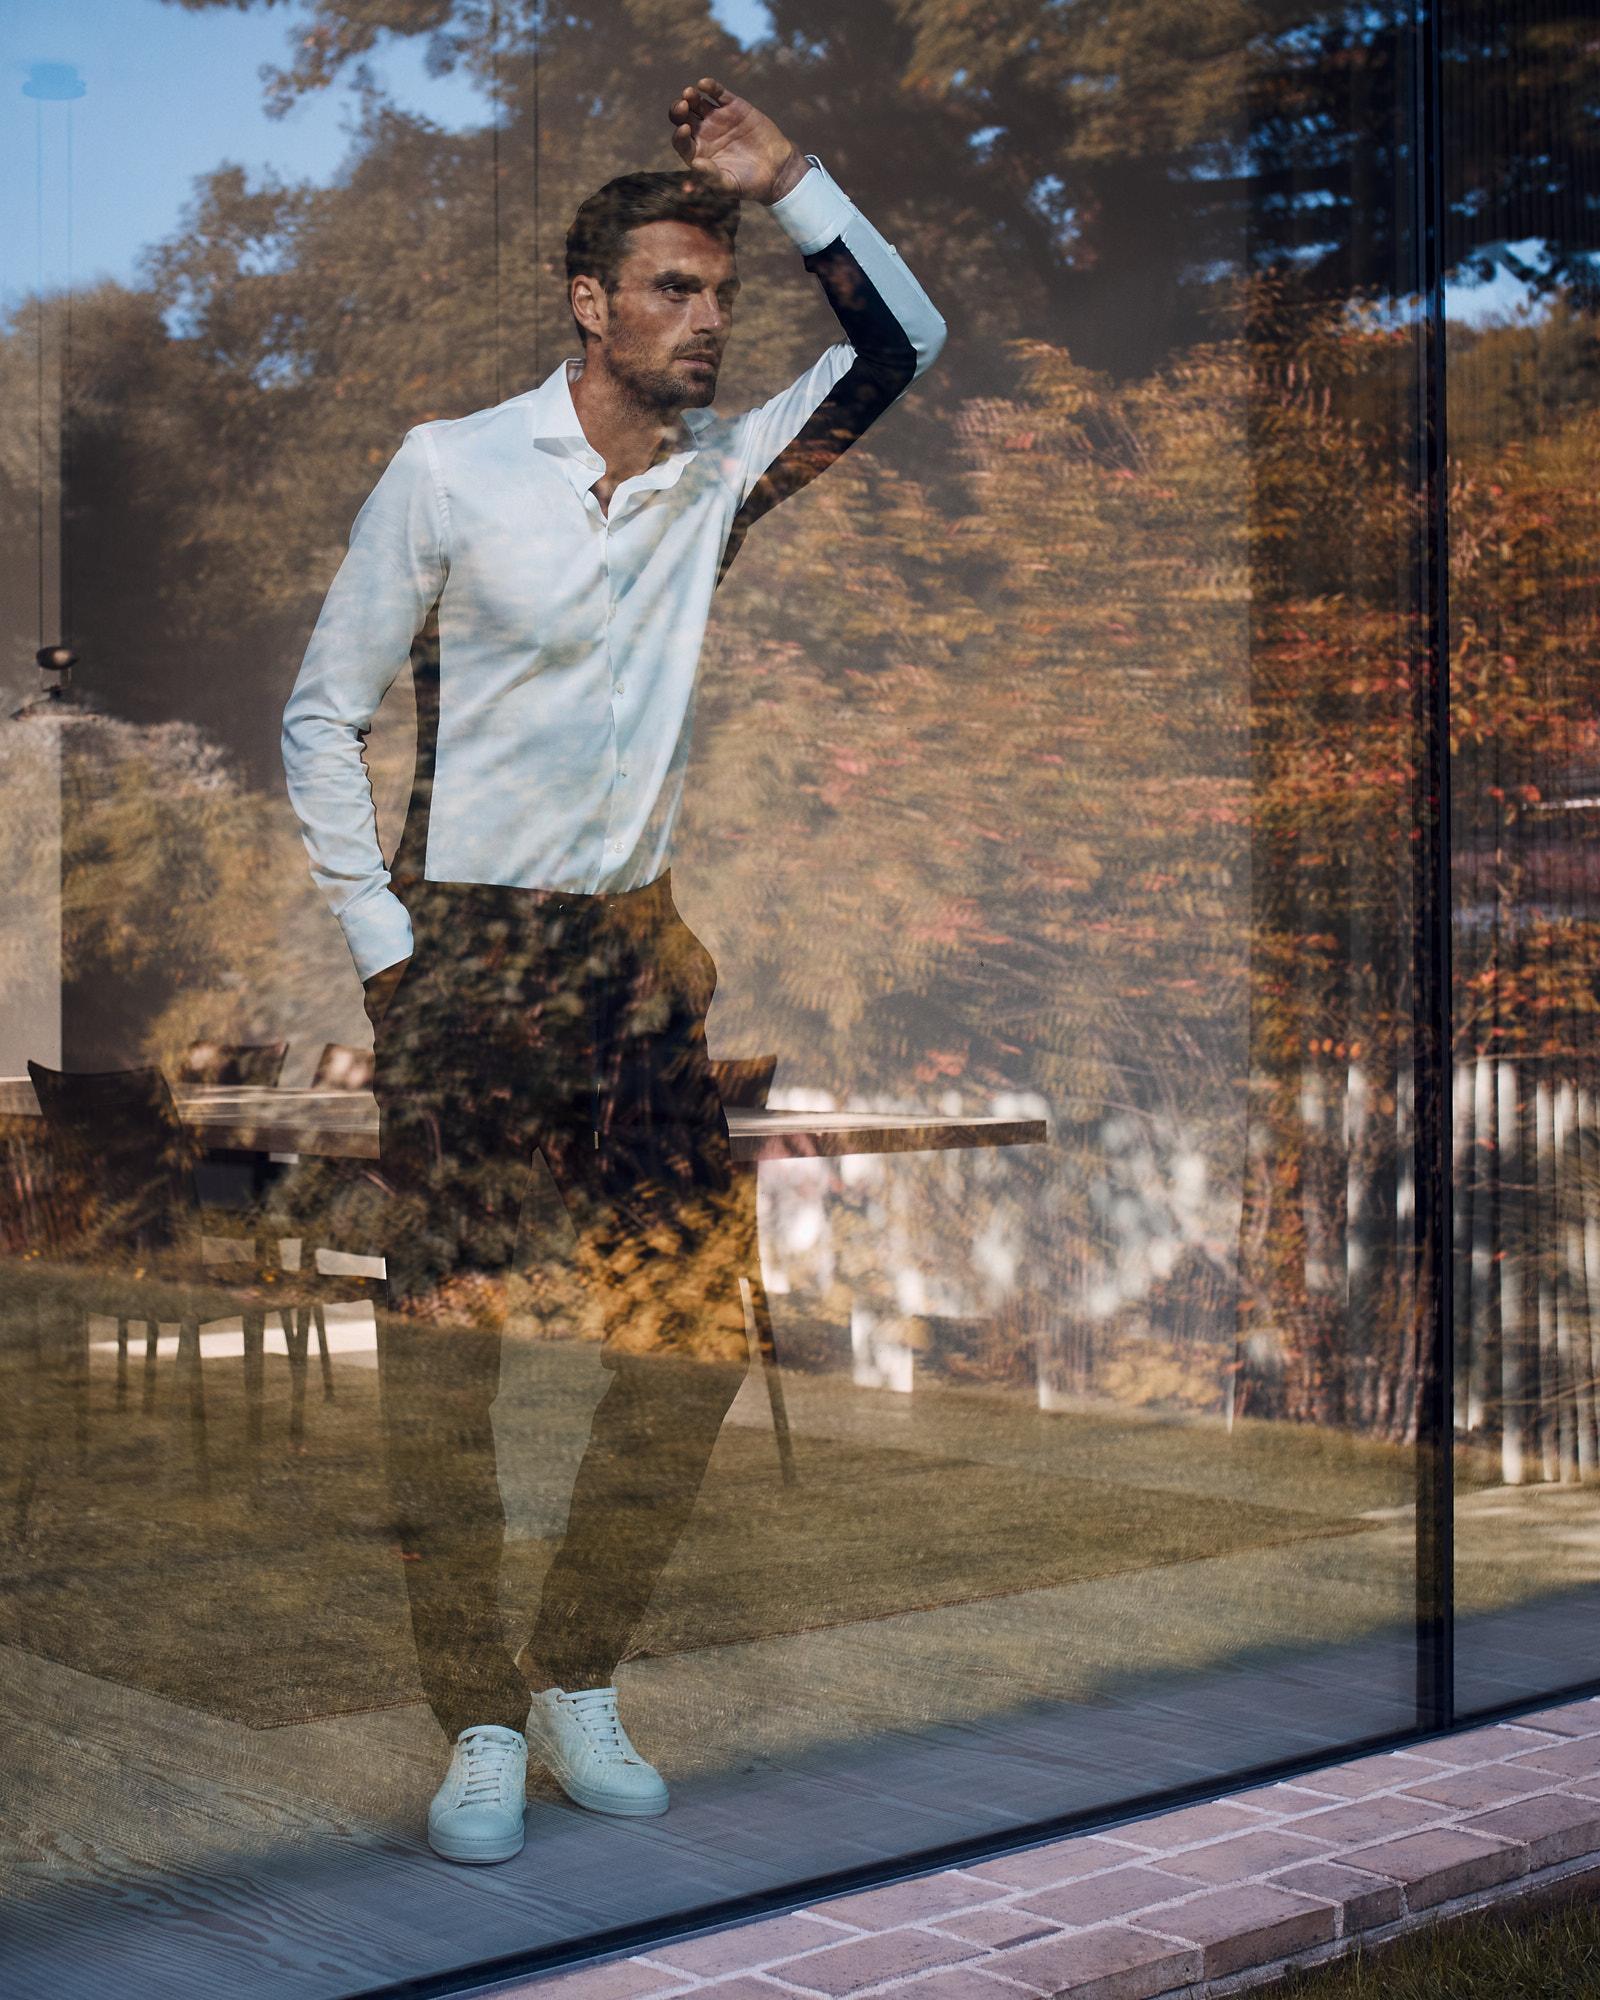 bernd-westphal-stillstars-vanlaack-men-auttum-winter-2020-fashion-still-life-photography-014